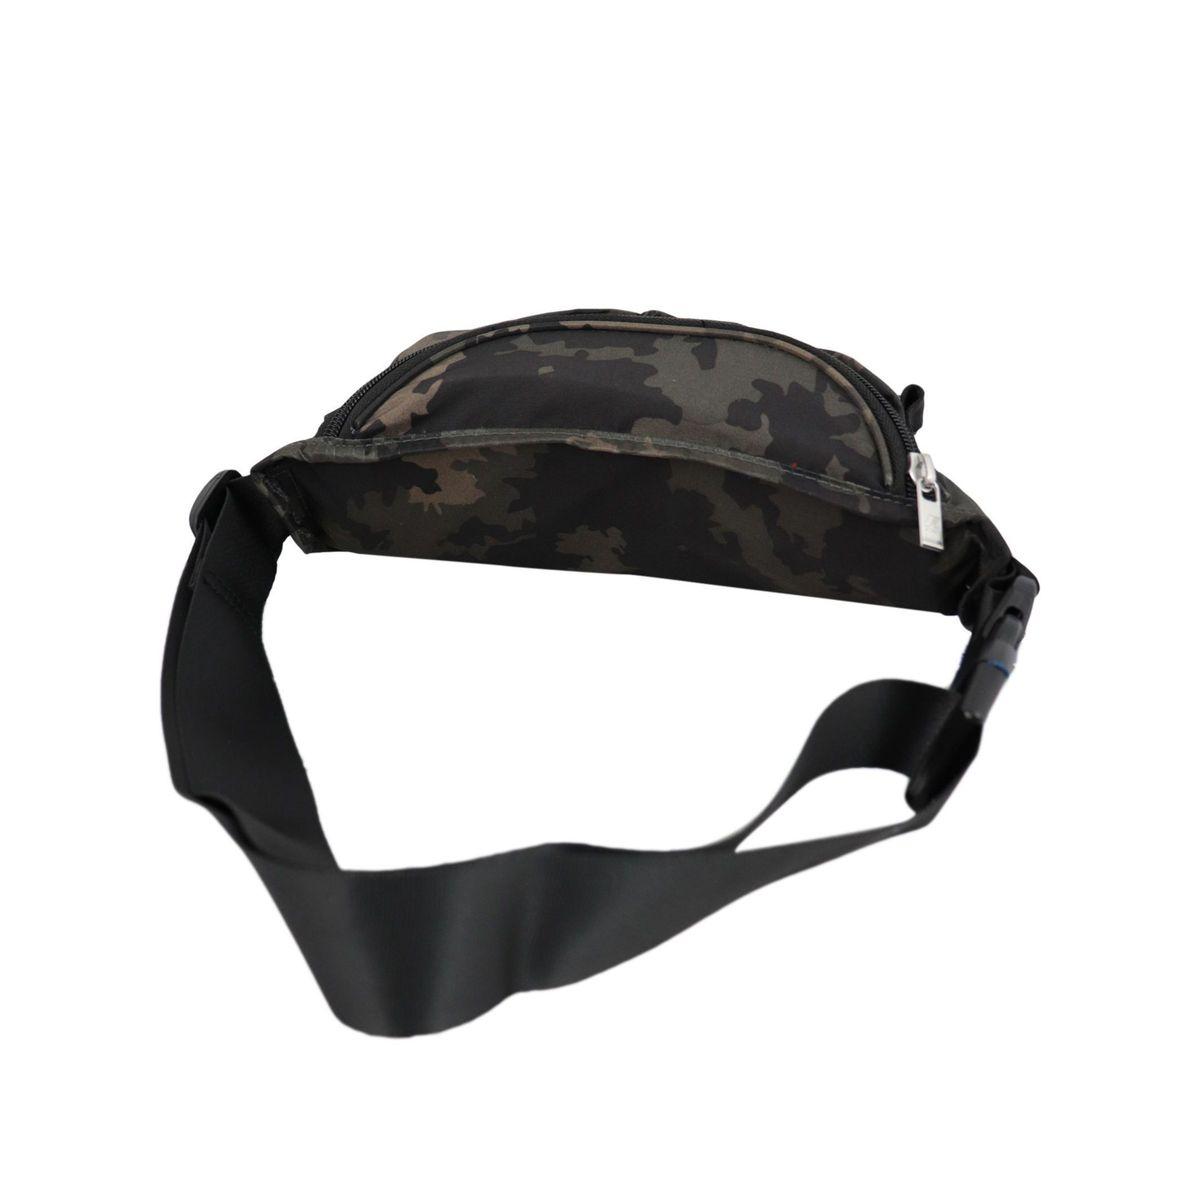 Nylon belt bag with double zip Camouflage K-Way